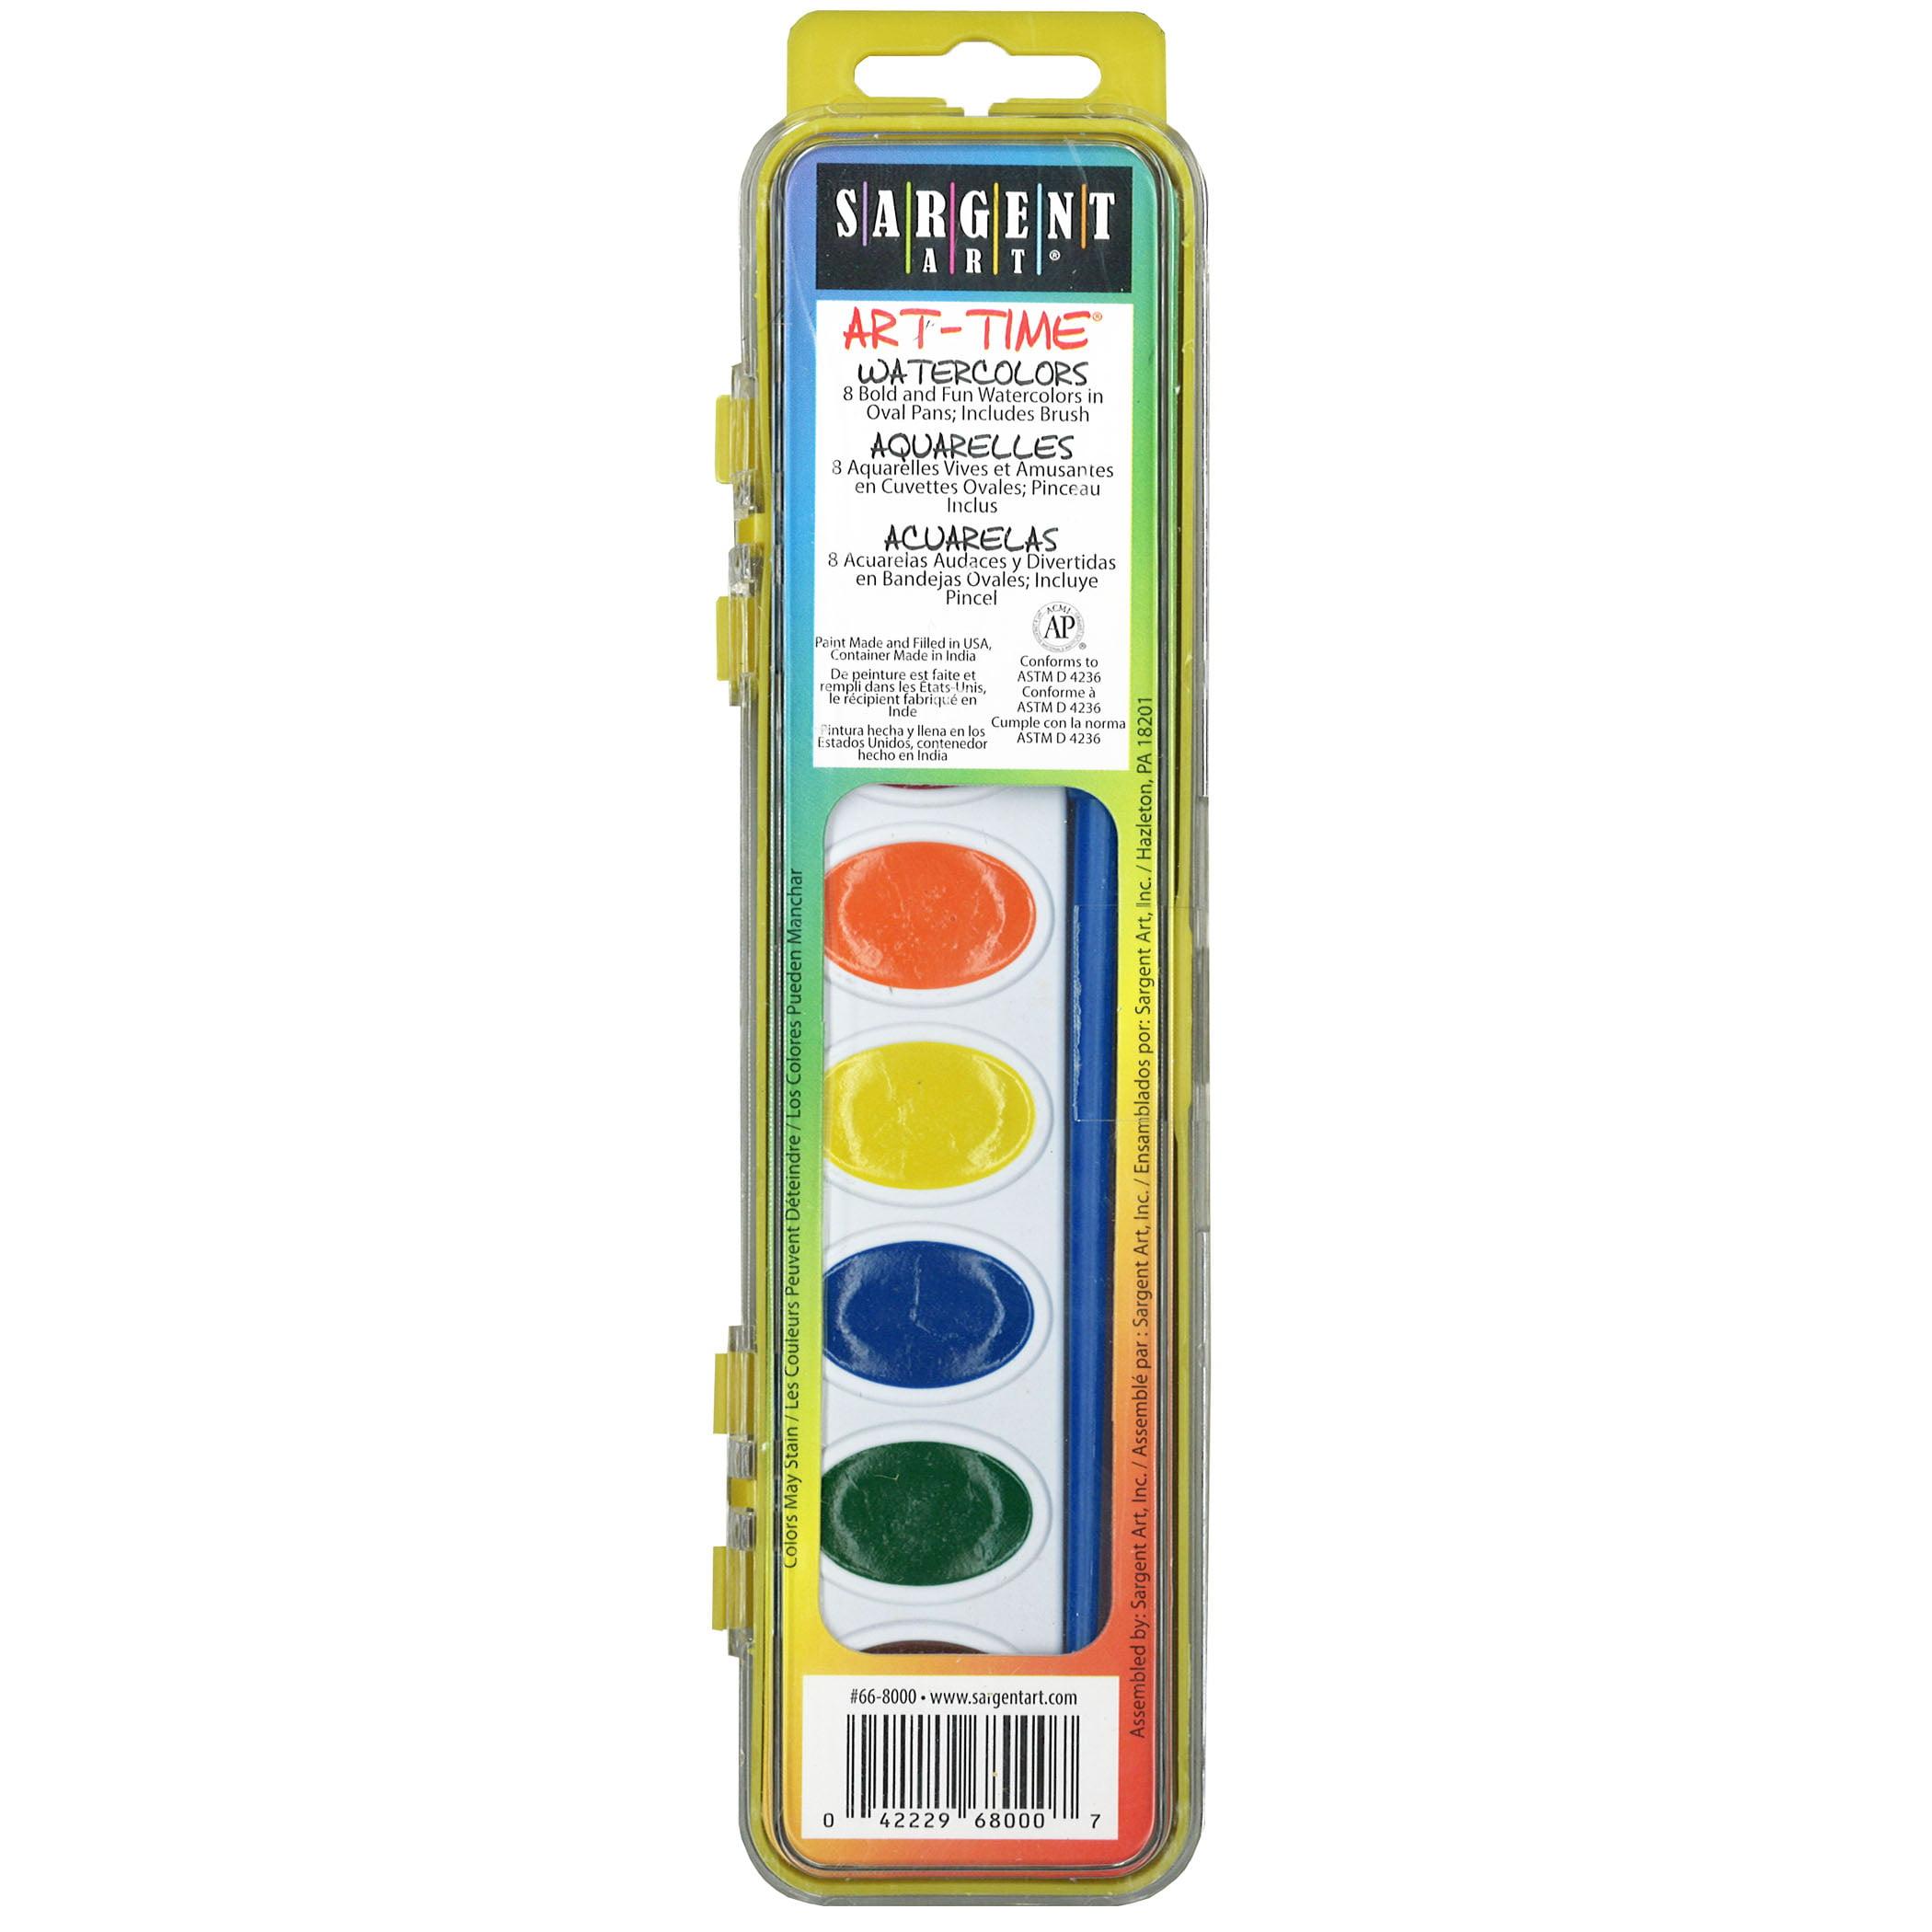 Art-Time® Watercolor Paints, 8 colors per pack, 24 packs